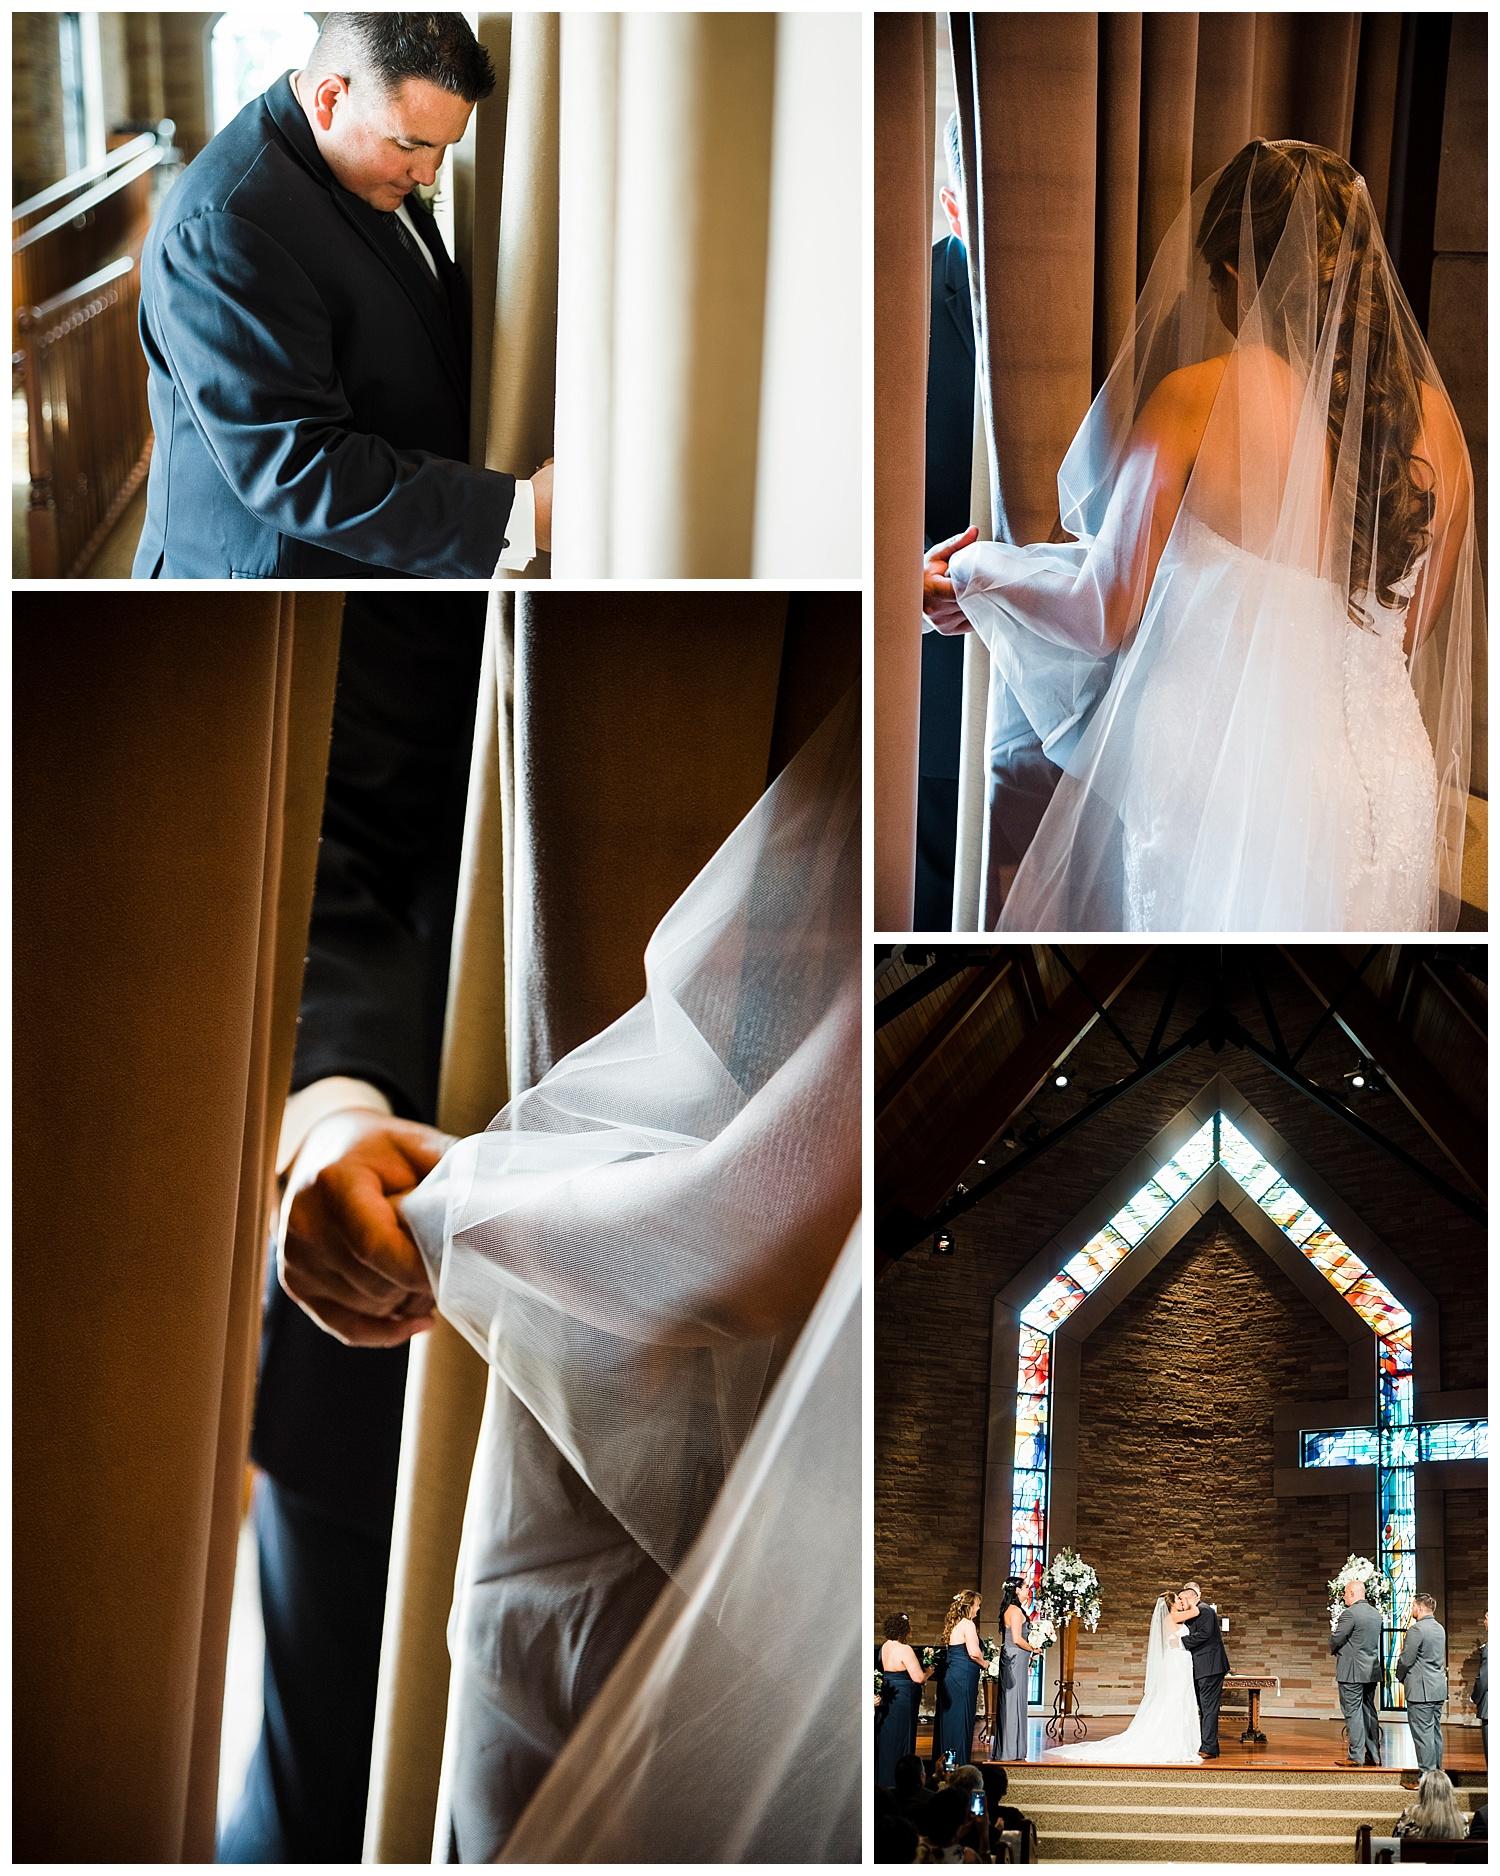 The_Barn_At_Evergreen_Memorial_Park_Wedding_Apollo_Fields_120.jpg